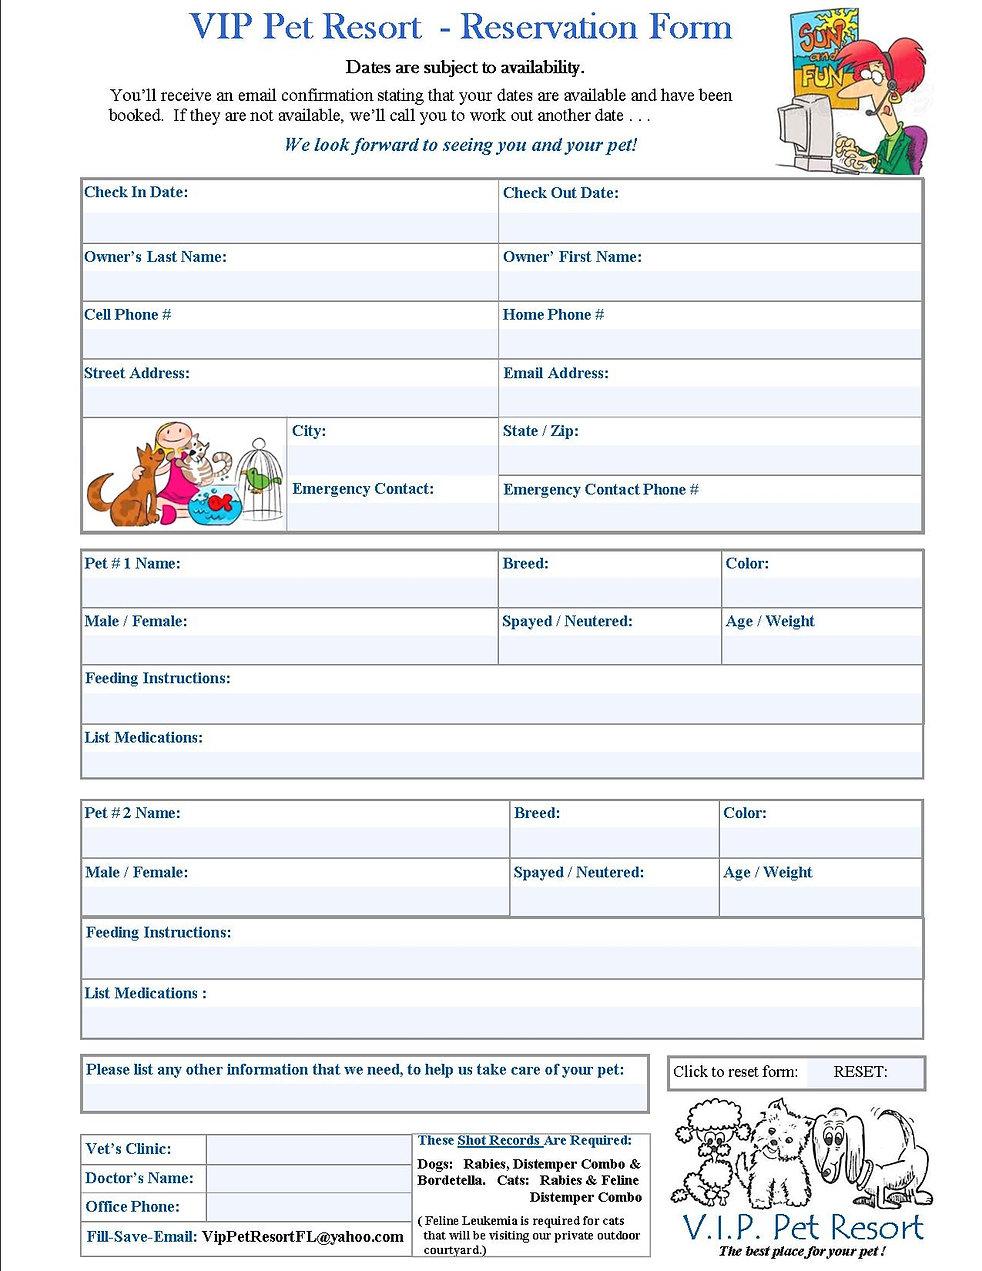 VIP Reservation Form - 5-2020.jpg